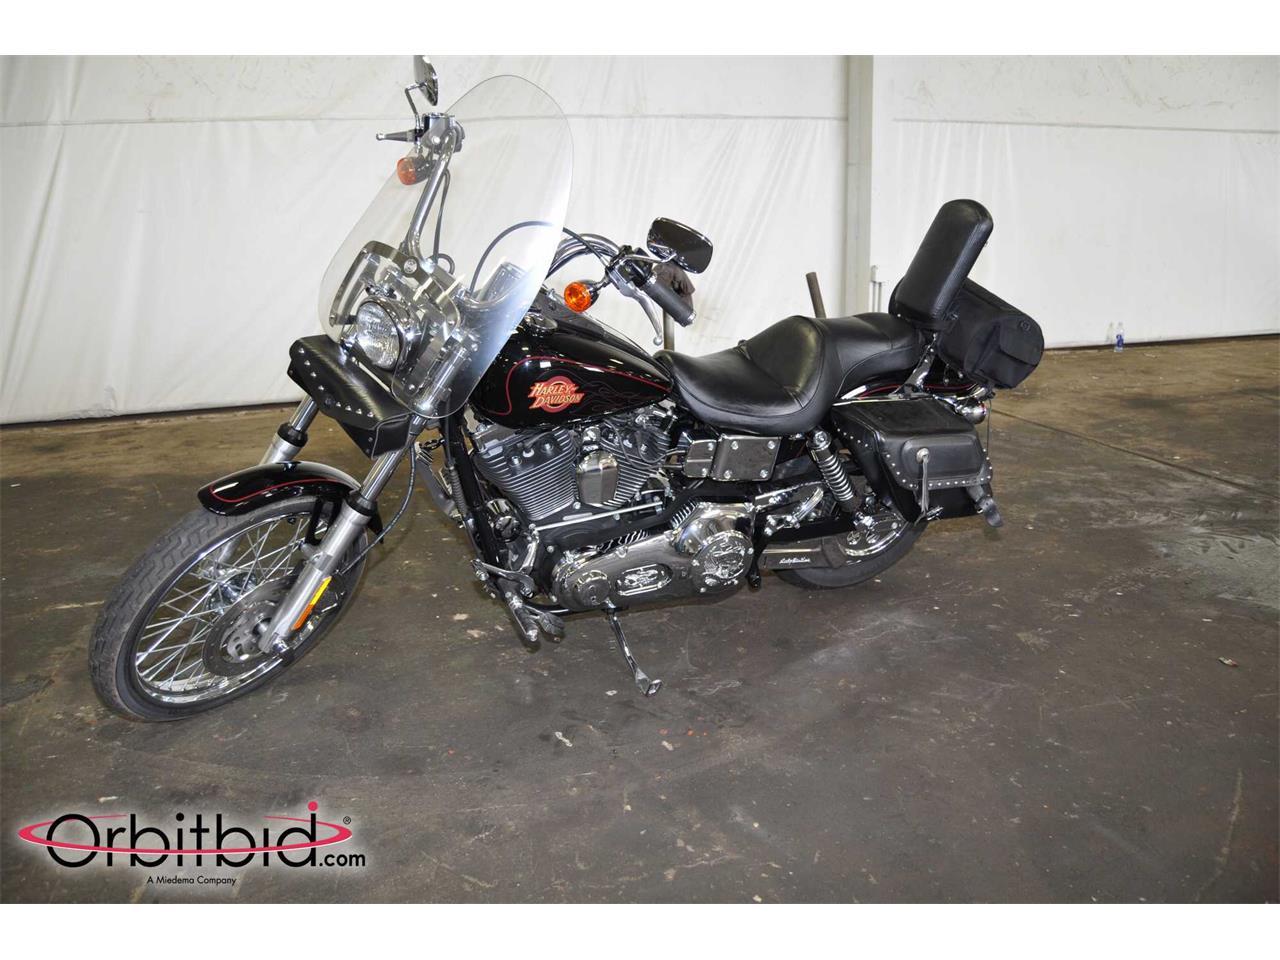 2001 Harley-Davidson Wide Glide (CC-1220548) for sale in Wayland, Michigan